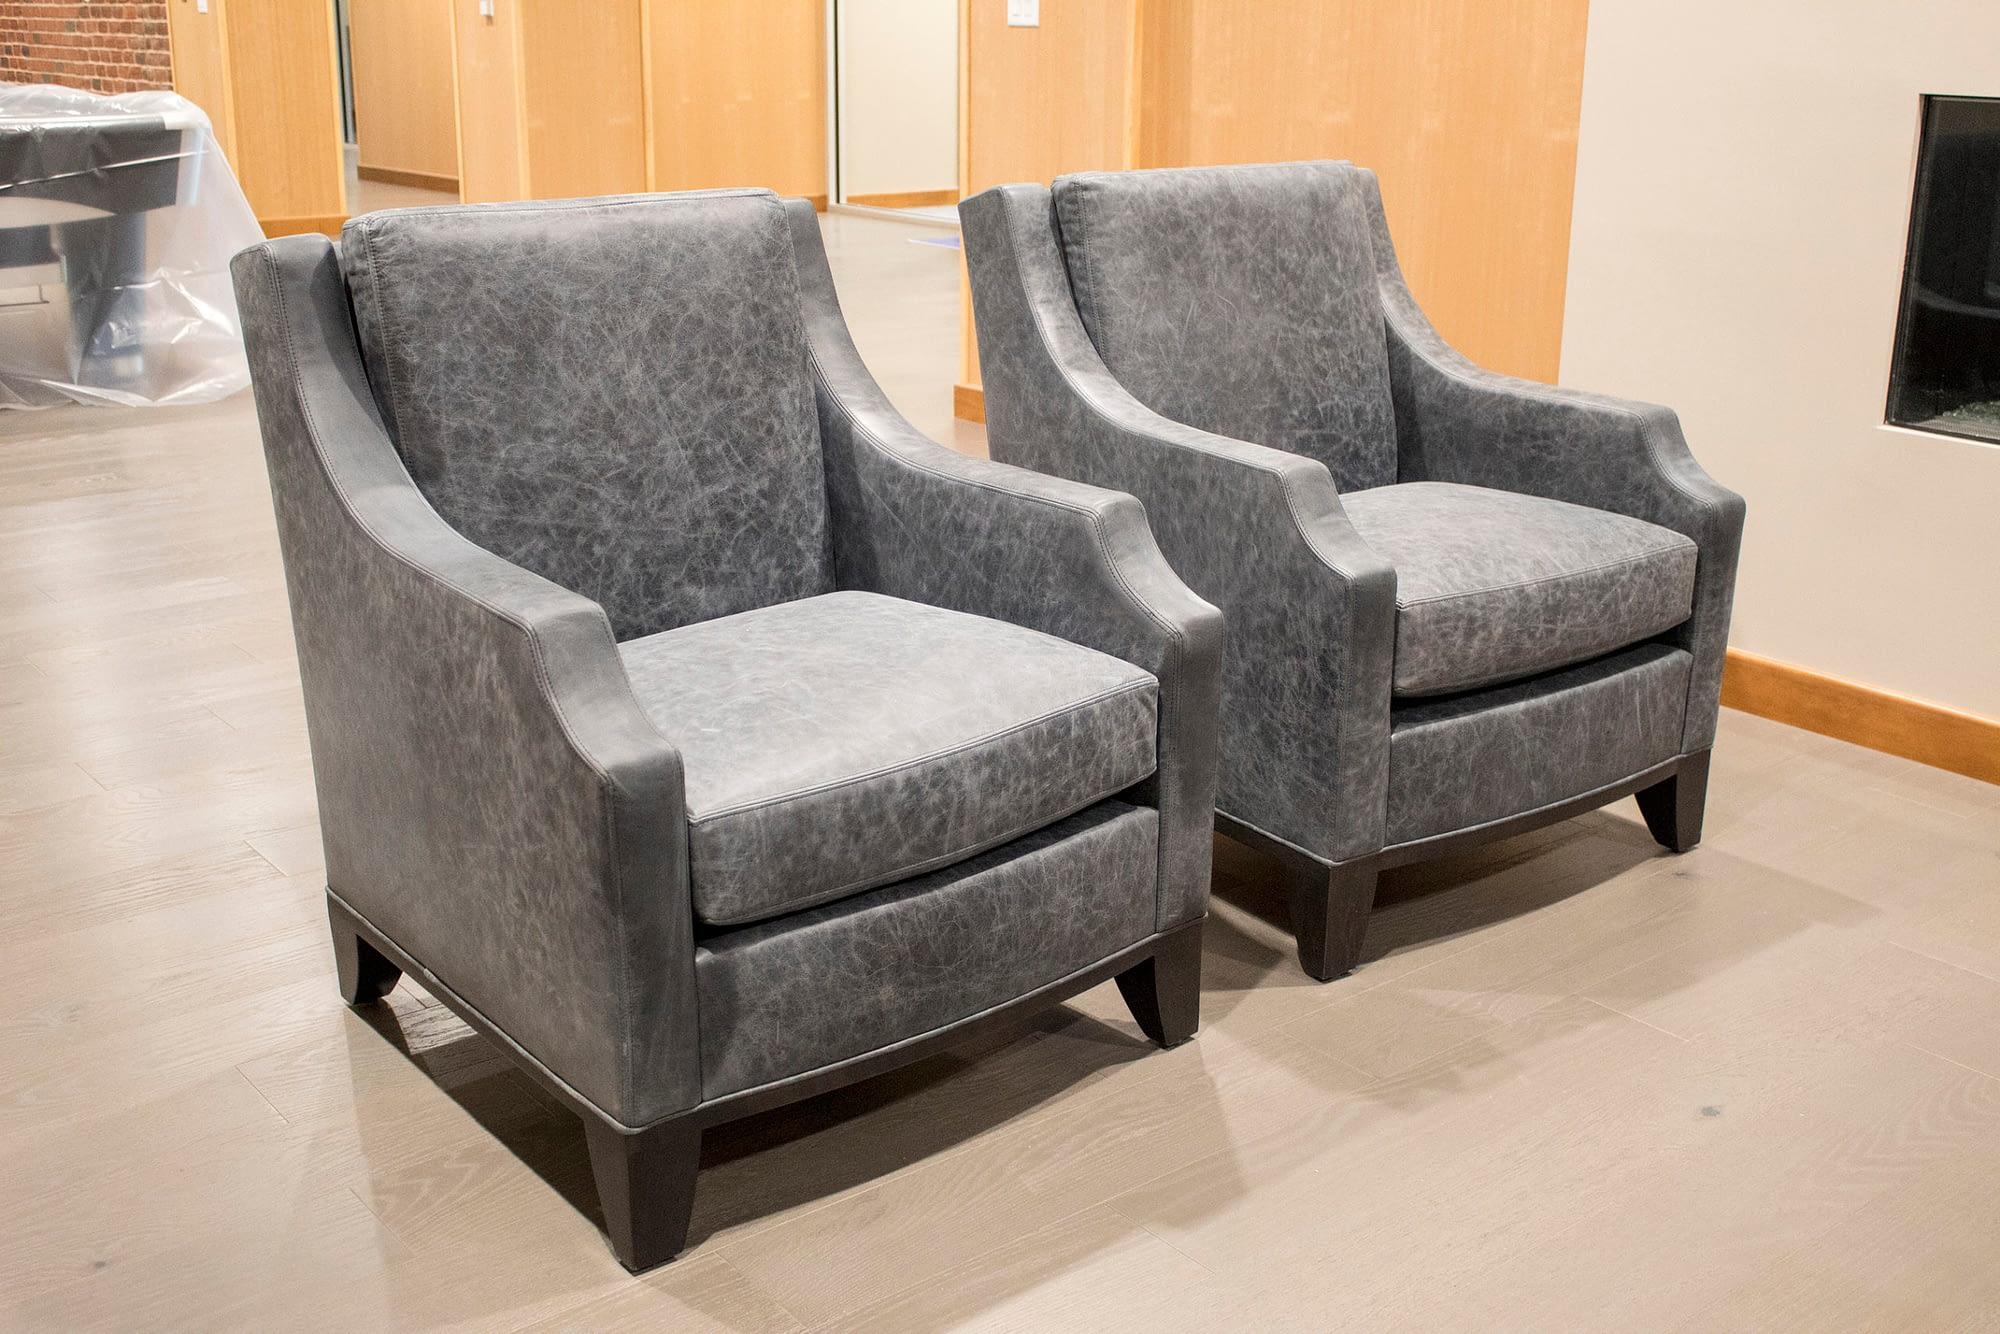 Executive Lounge Chairs